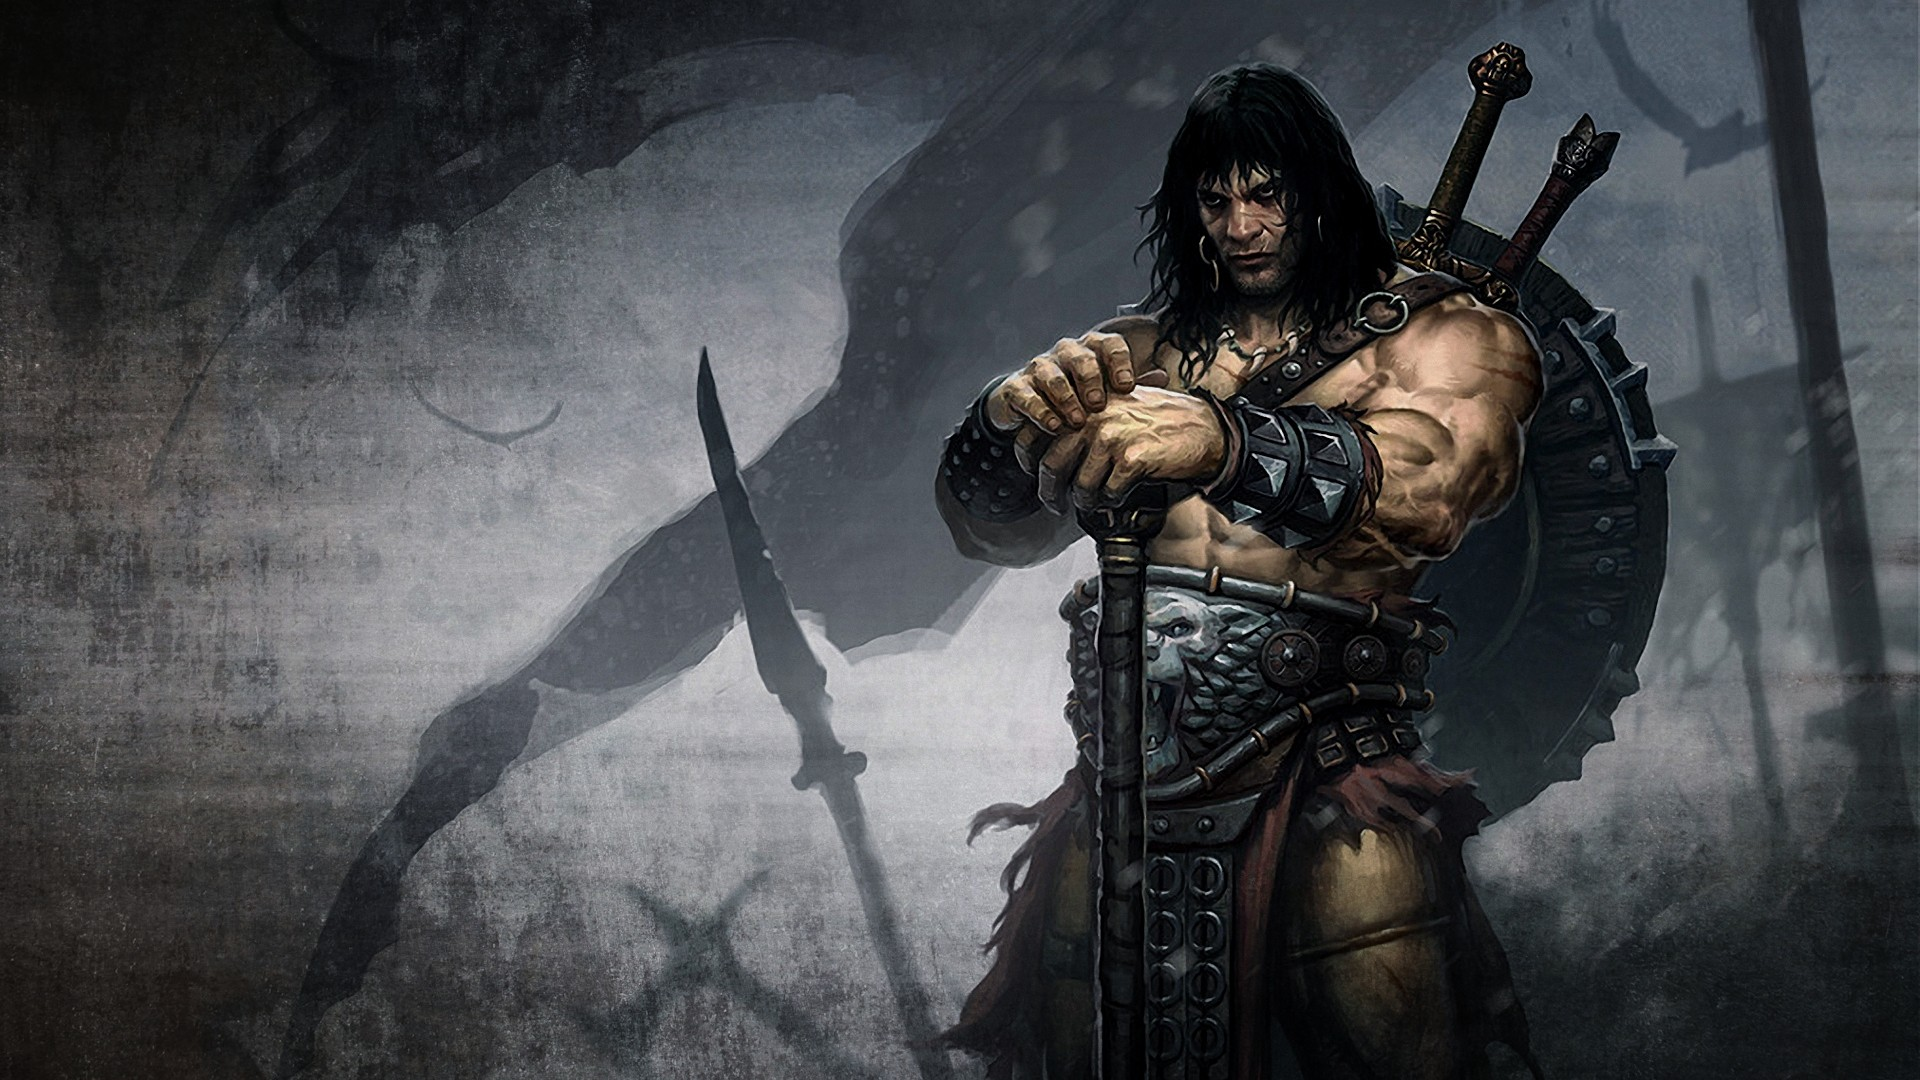 Wallpapers fantasy art artwork Conan the Barbarian 1920x1080